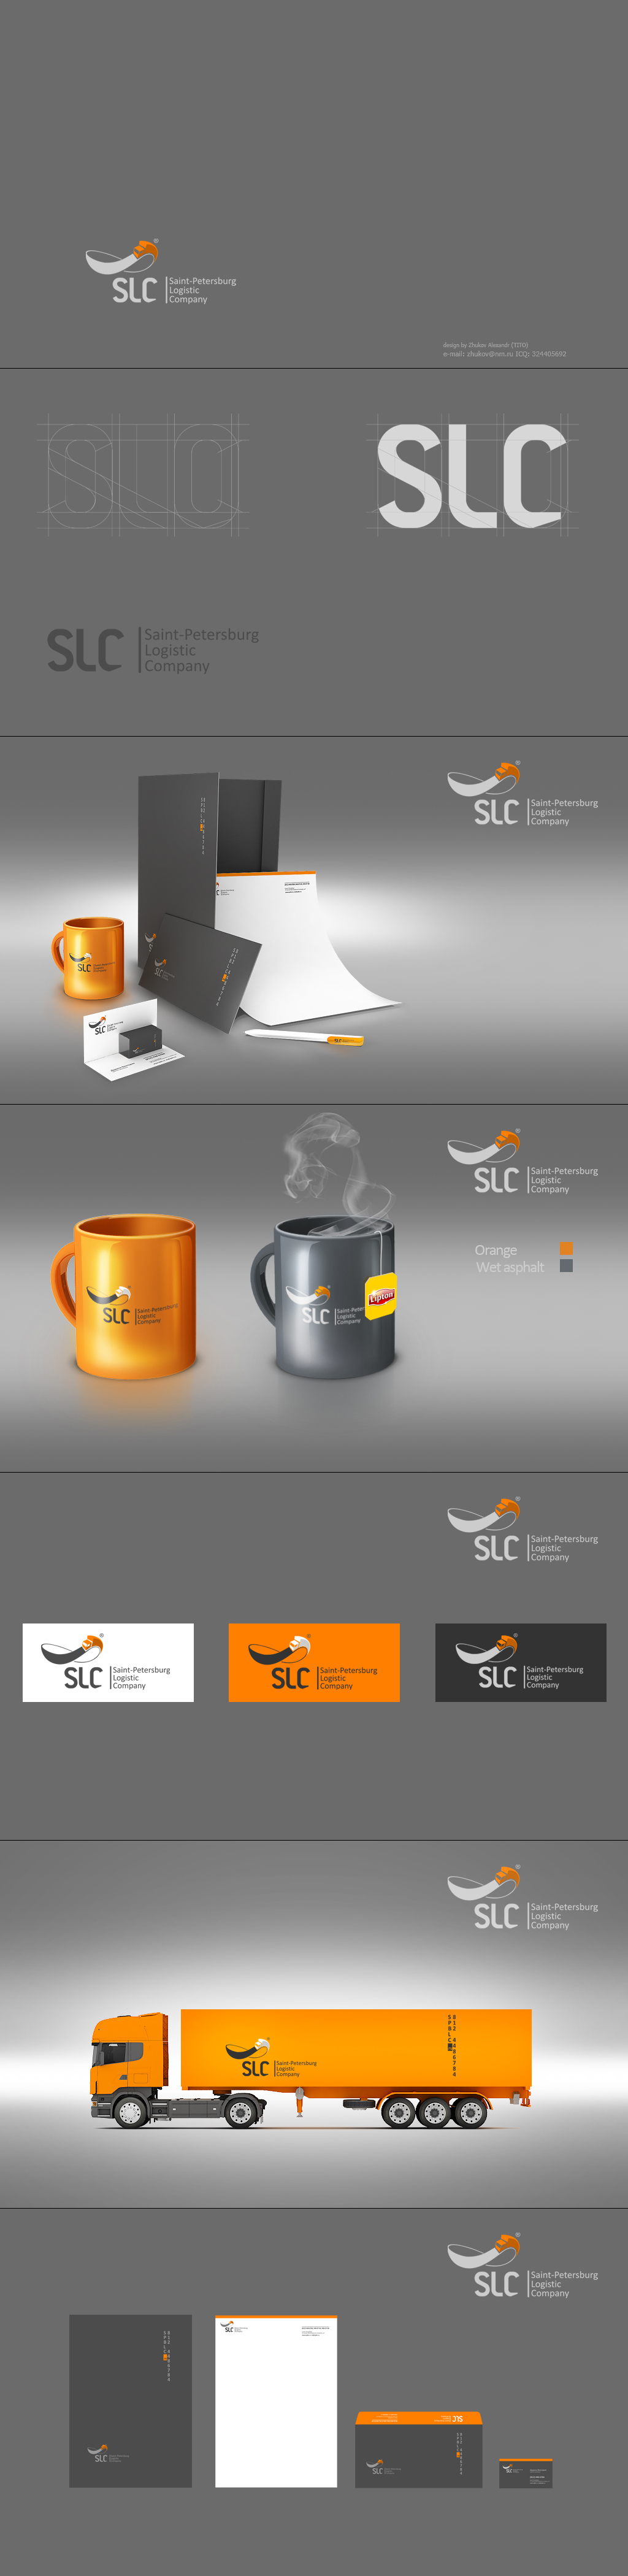 SLC_full by TIT0